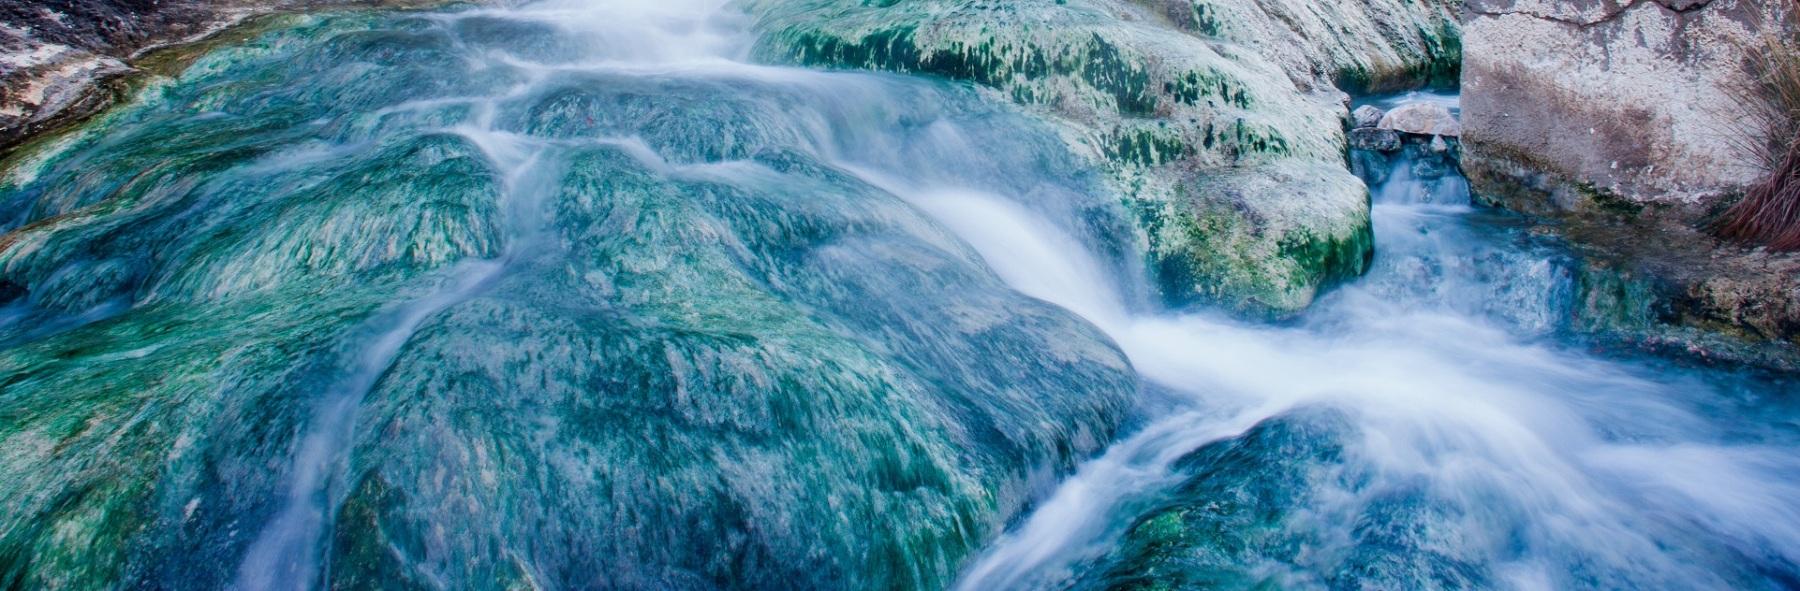 Thermopyles Water